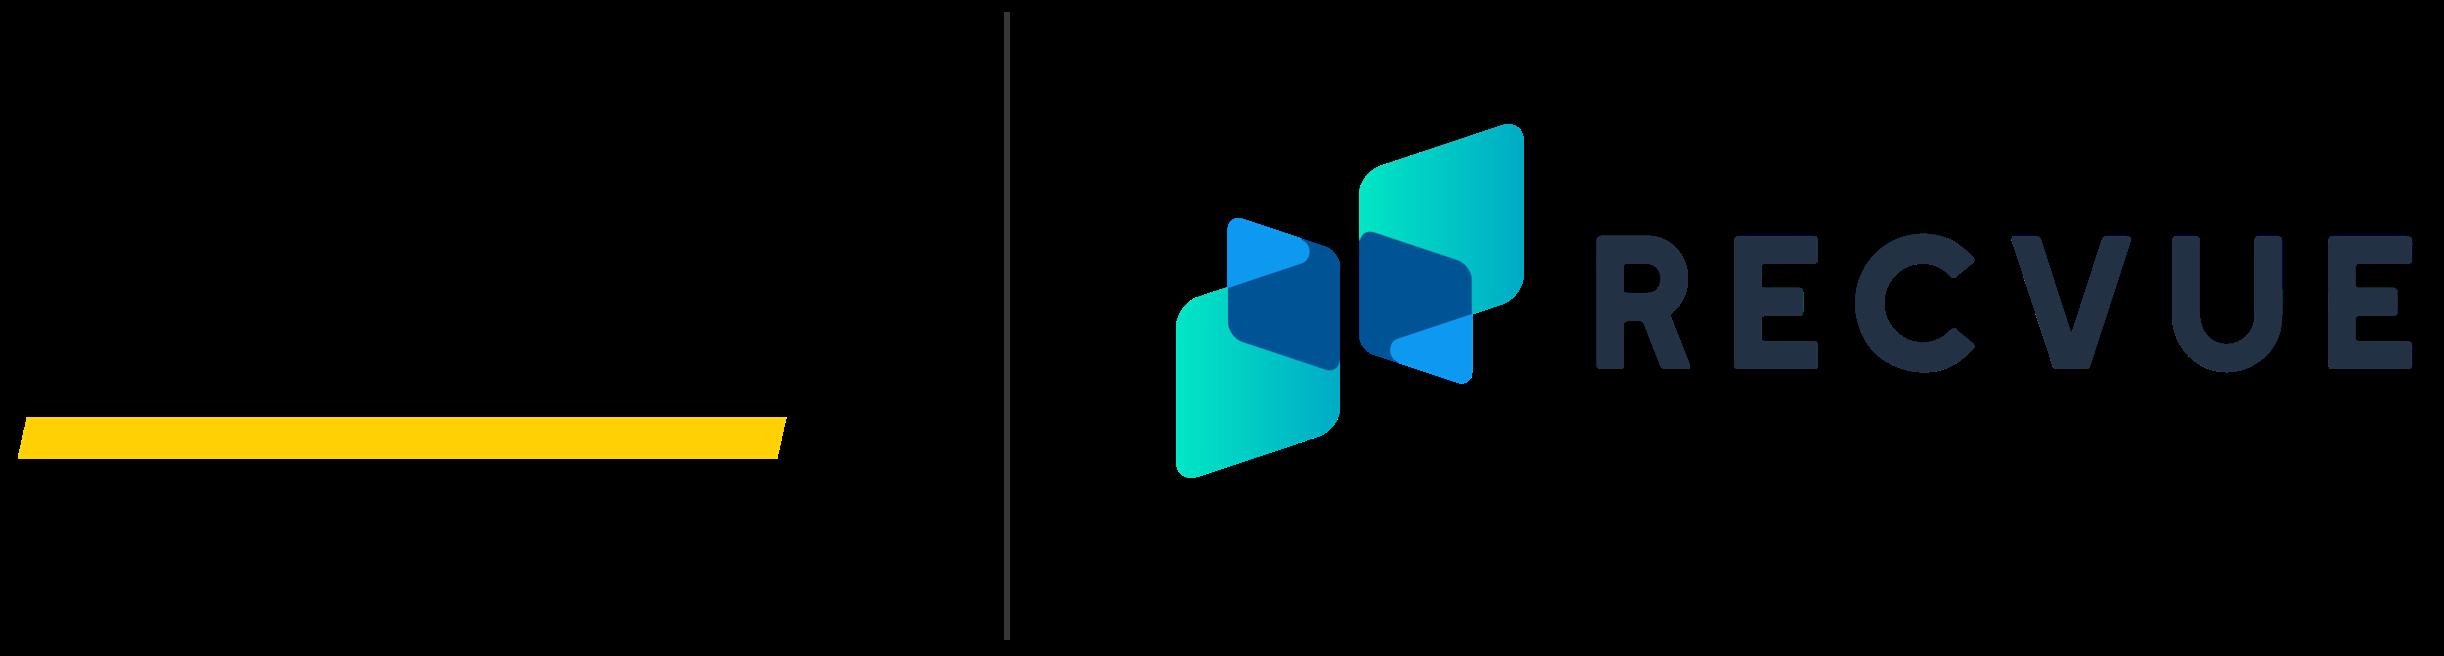 Hertz and Recvue logo